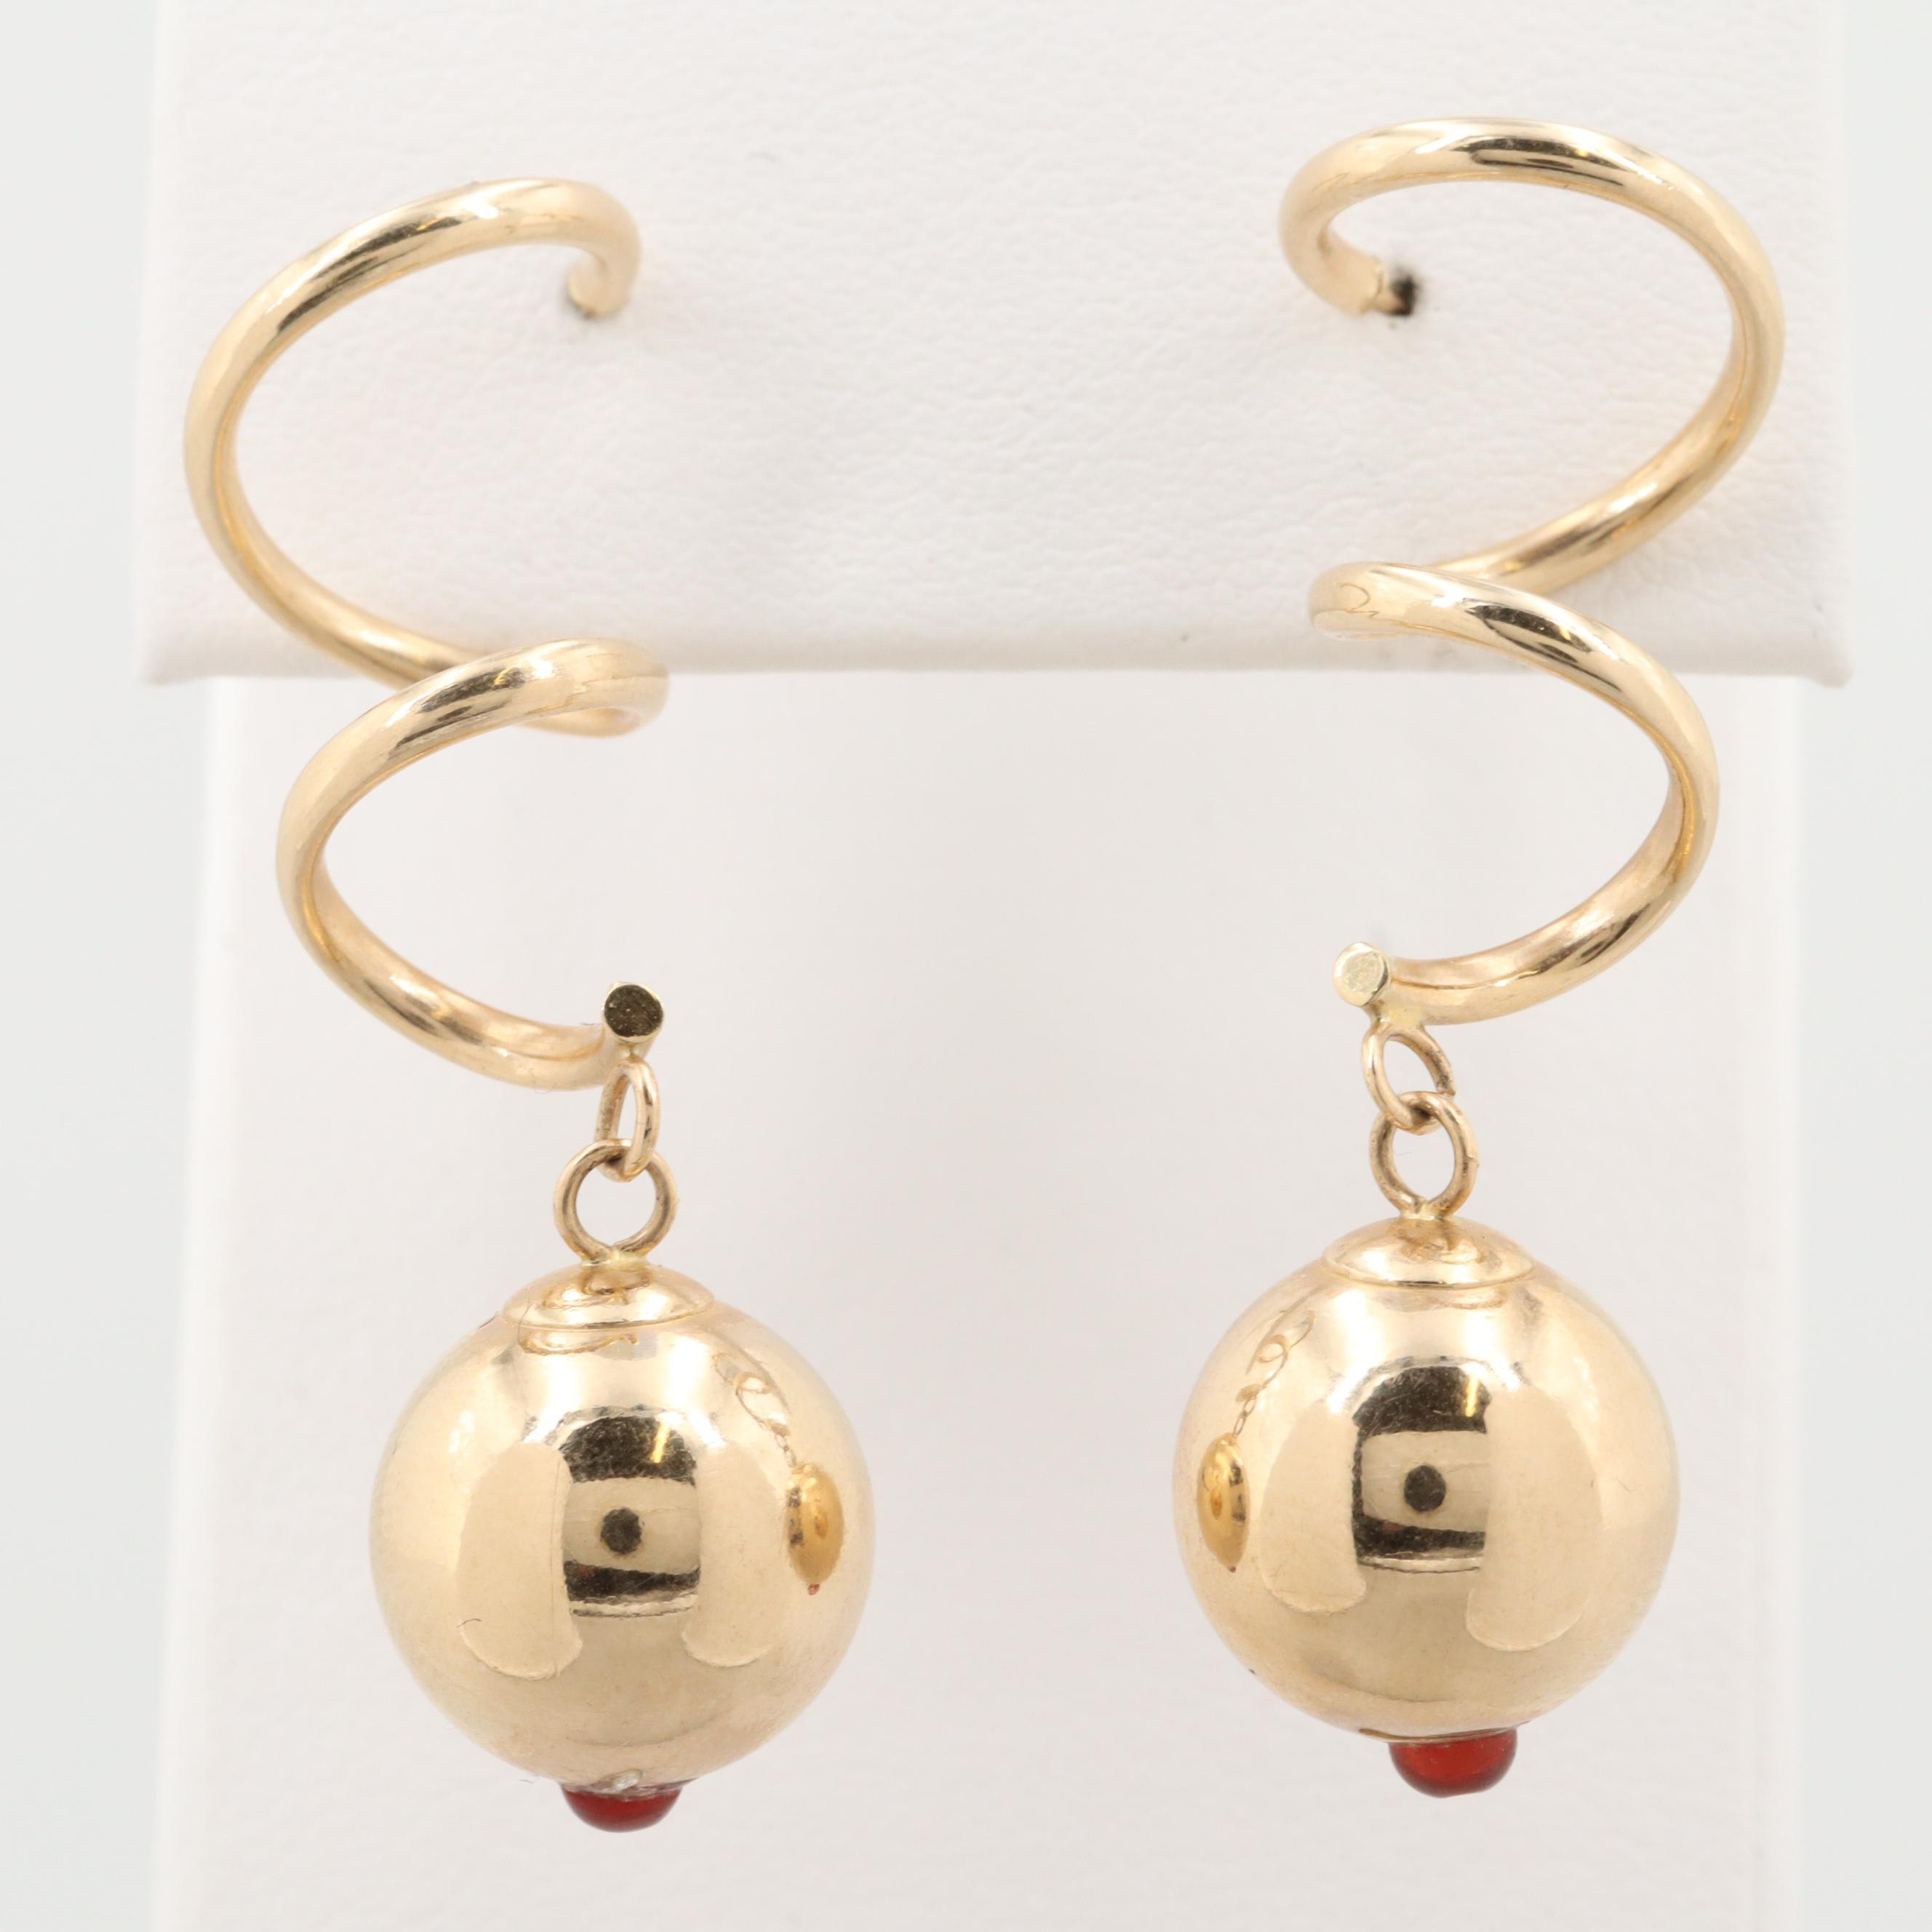 14K Yellow Gold Dangle Resin Earrings